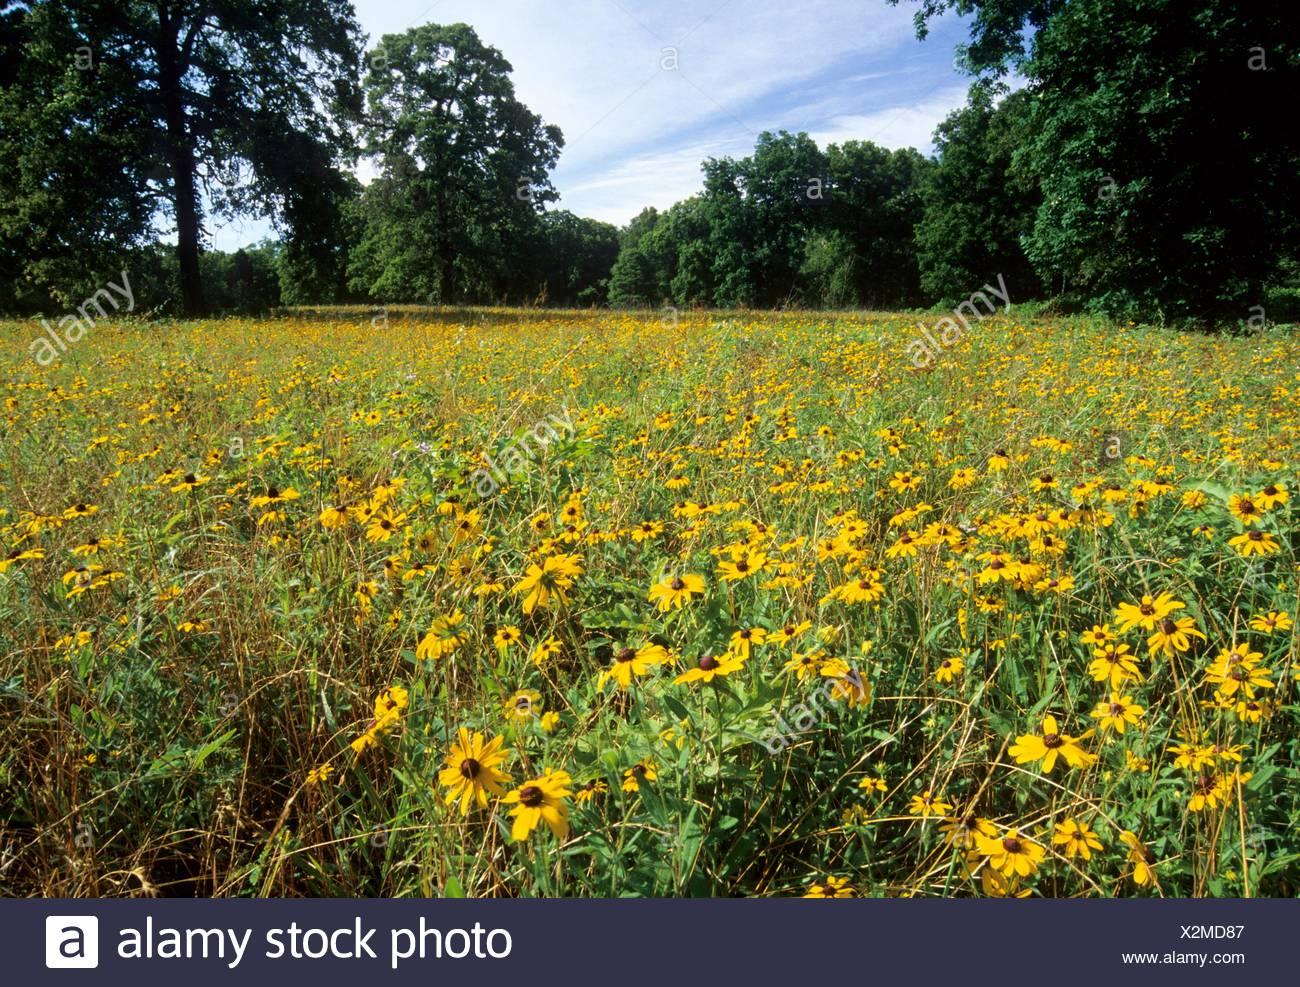 Wildflower field, Gus Engeling Wildlife Management Area, Texas. Stock Photo